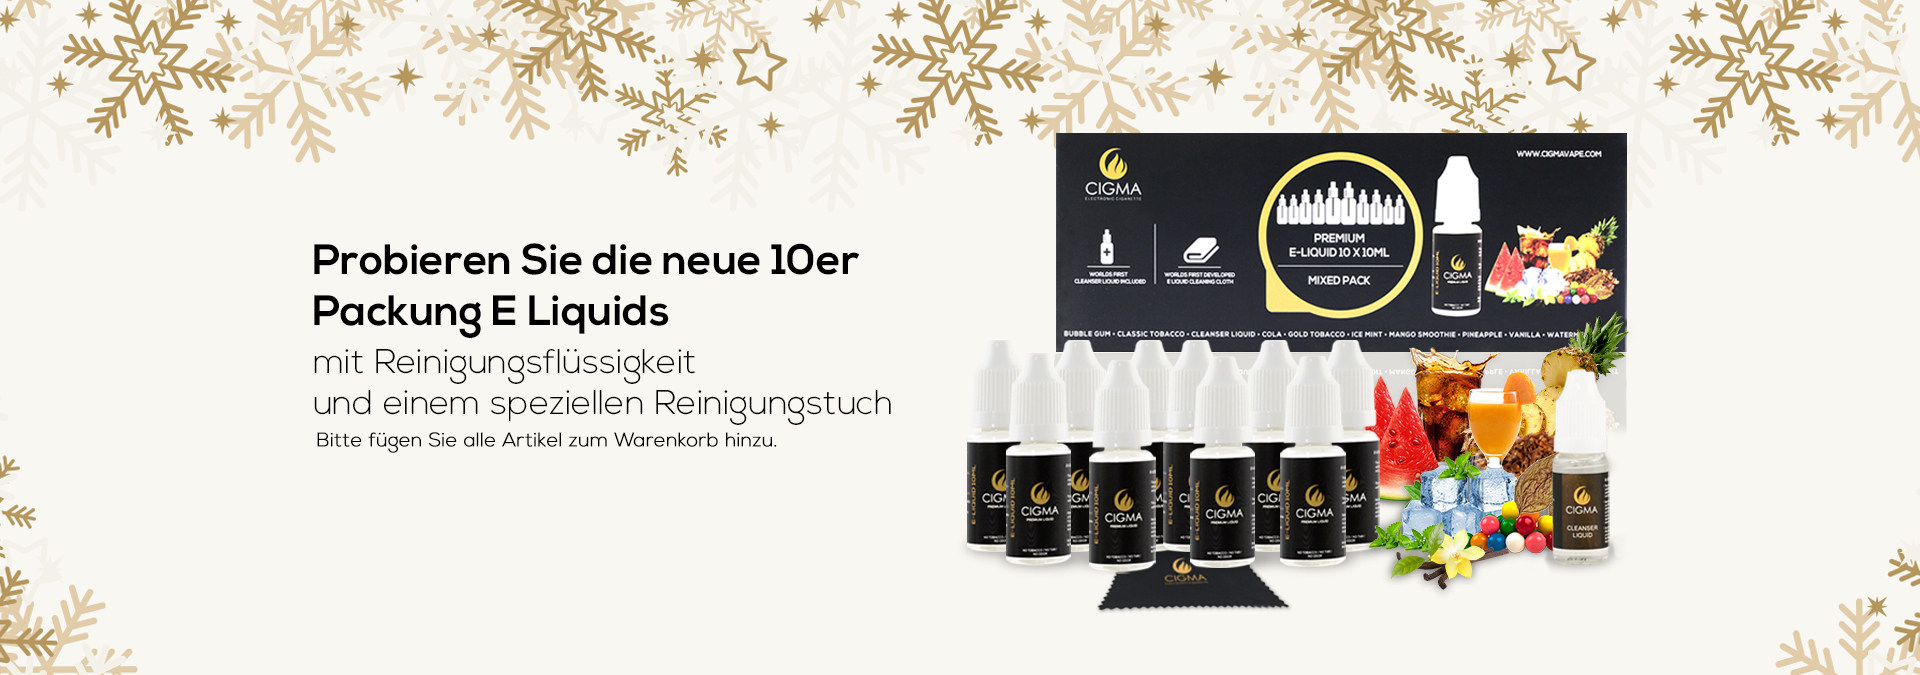 Winter-theme-For-cigmavape-German-Banner-3